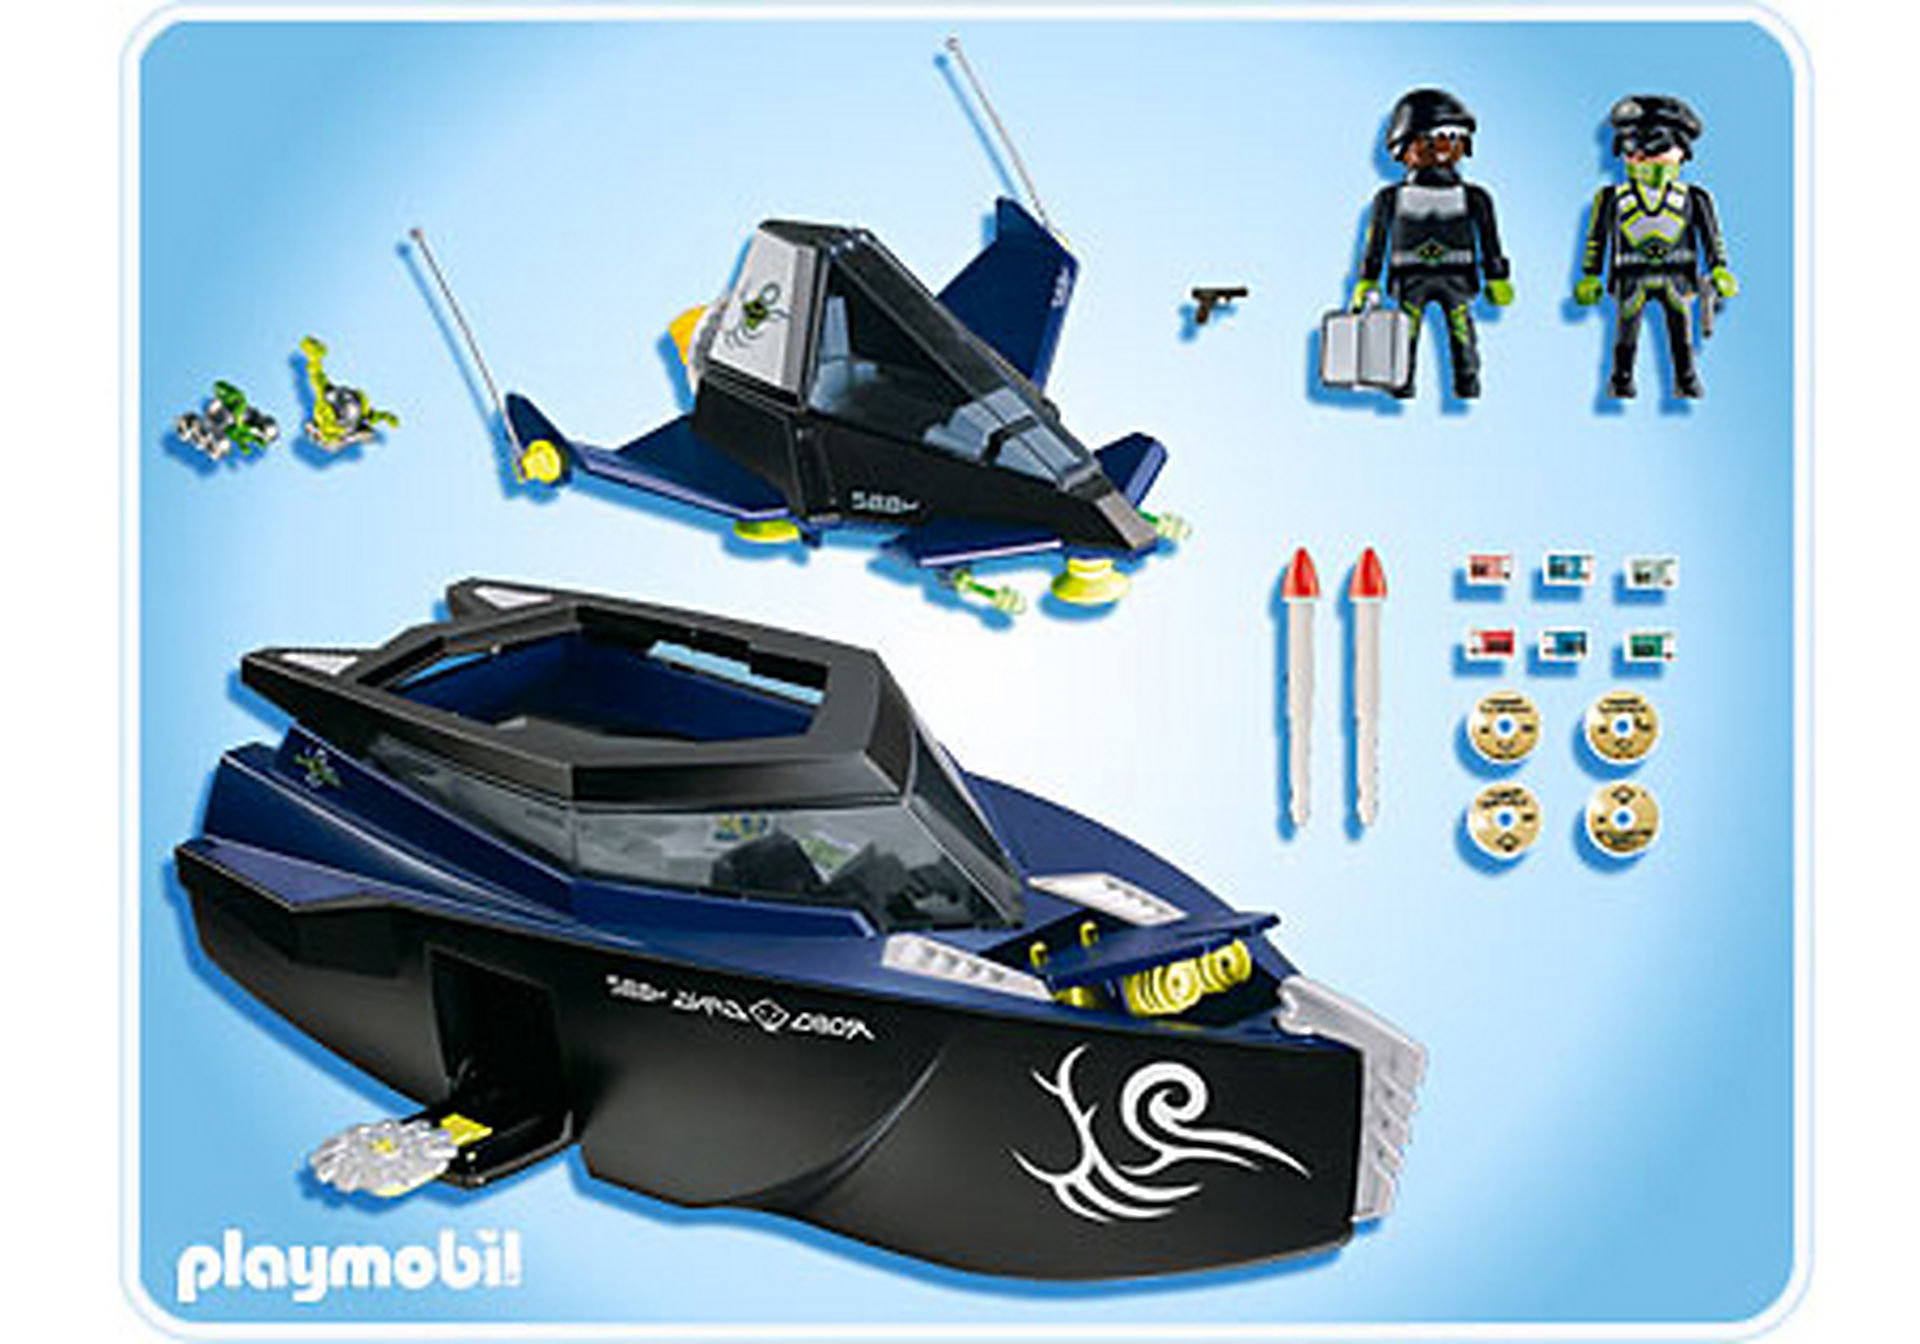 4882-A Robo-Gangster Turbokampfschiff zoom image2